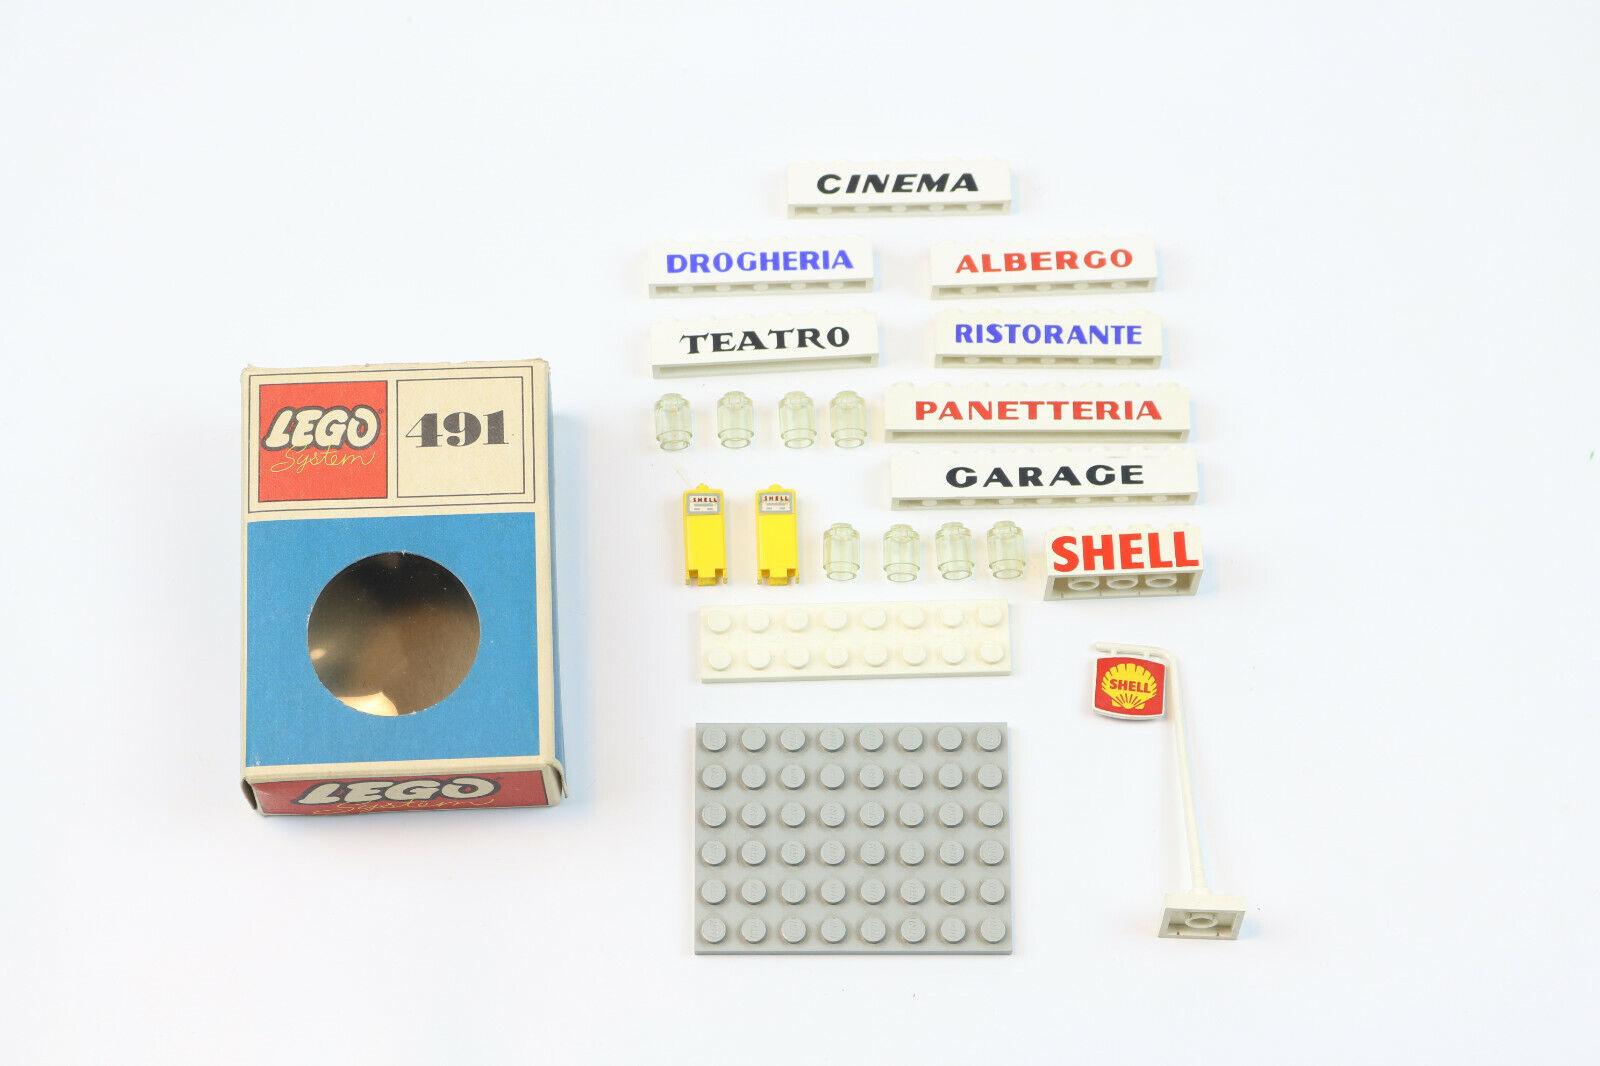 LEGO SYSTEM VINTAGE SET 491 SHELL BENZINA DISTRIBUTORE LEGOLAND OLD TOY '60